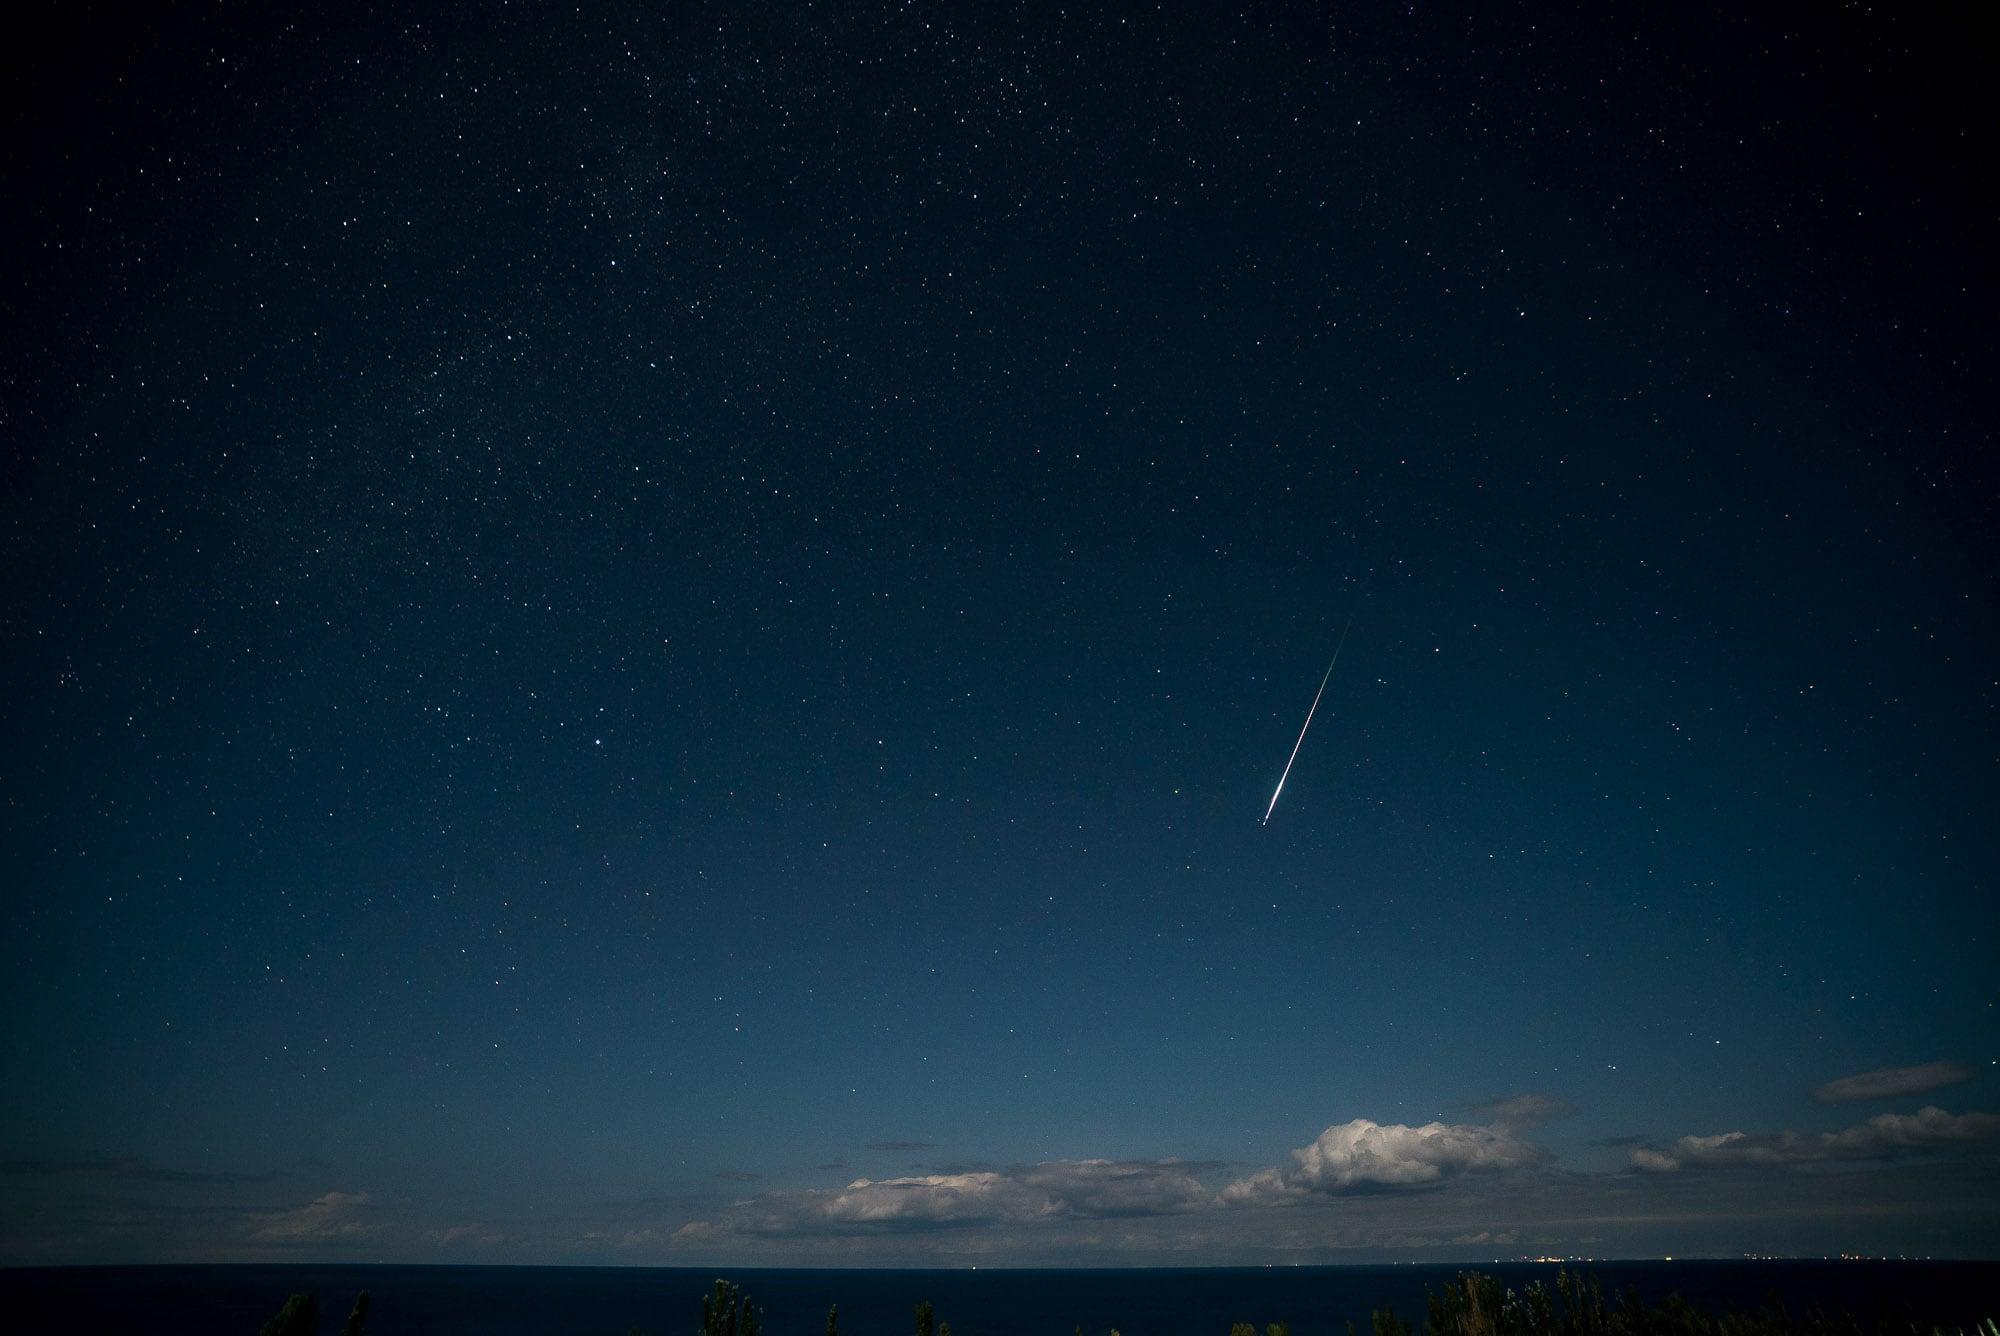 bigger shooting star